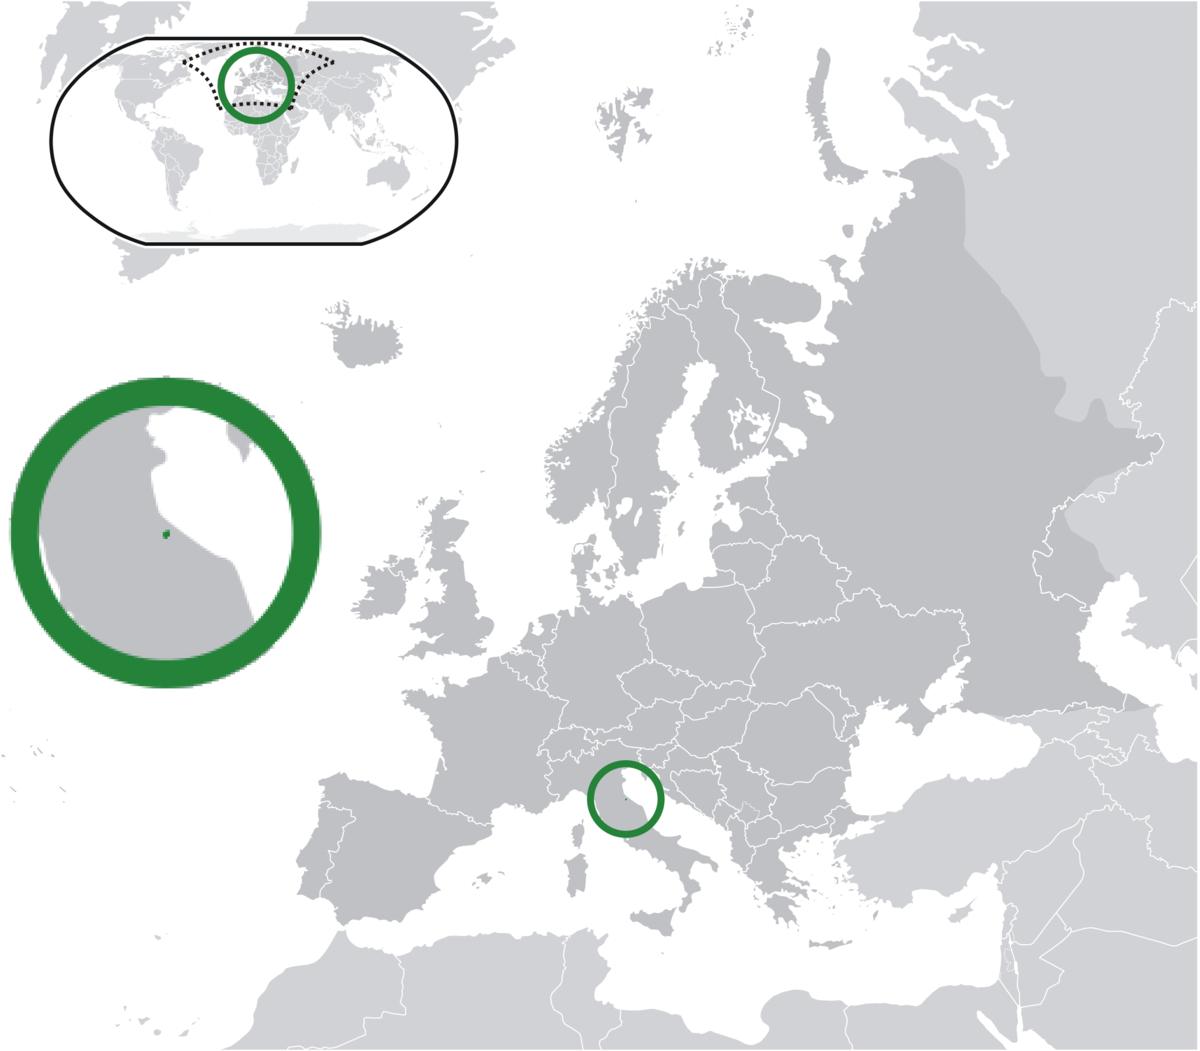 Saint-Marin — Wikipédia concernant Carte Capitale Europe